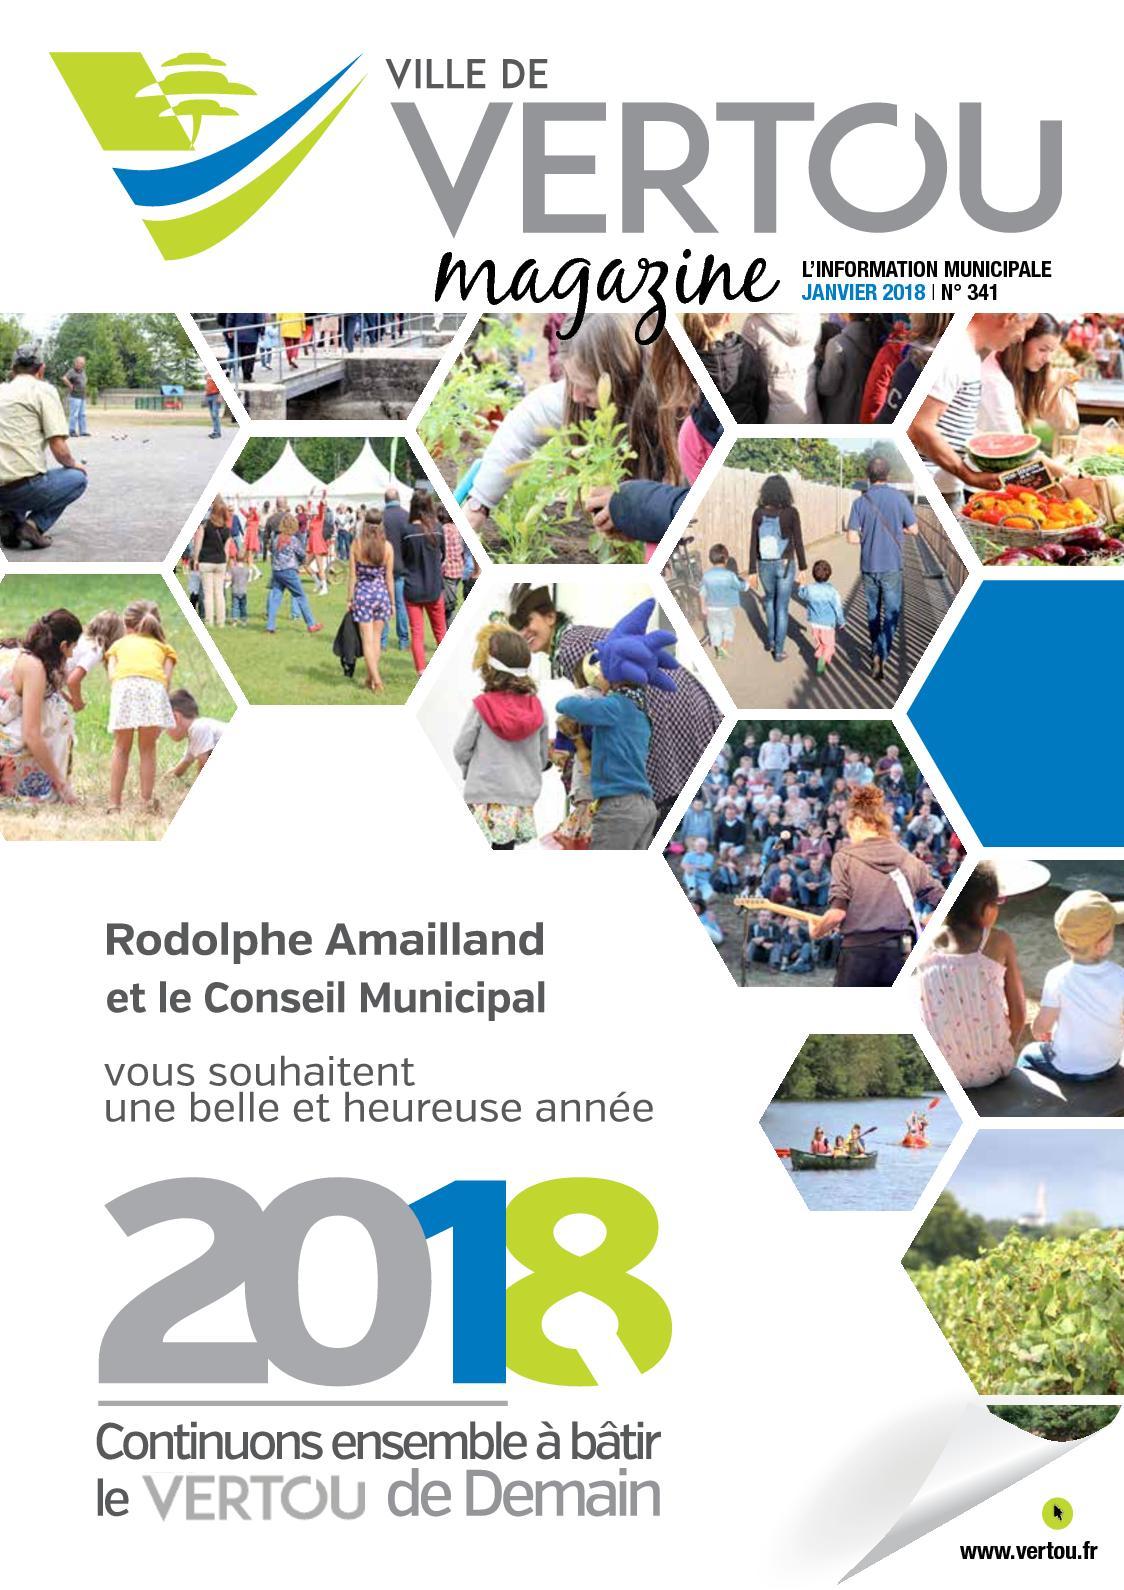 Atlantic Bain Morisseau Vertou calaméo - janv. 2018 - vertou magazine n°341